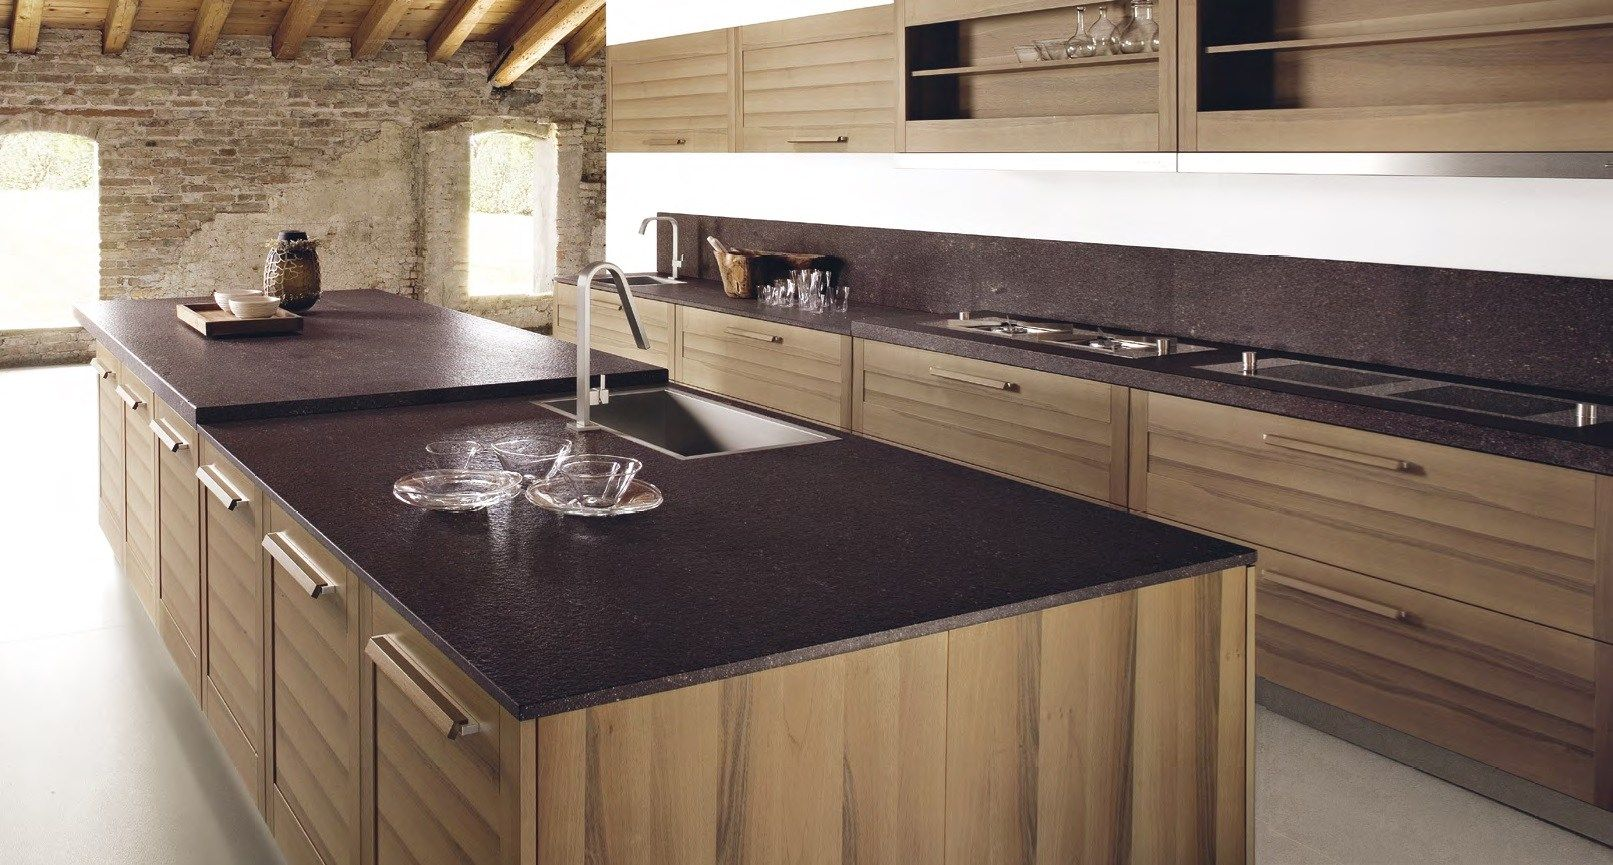 Cuisine design bois massif cuisine pinterest bois massif massif et bois - Cuisine en bois design ...